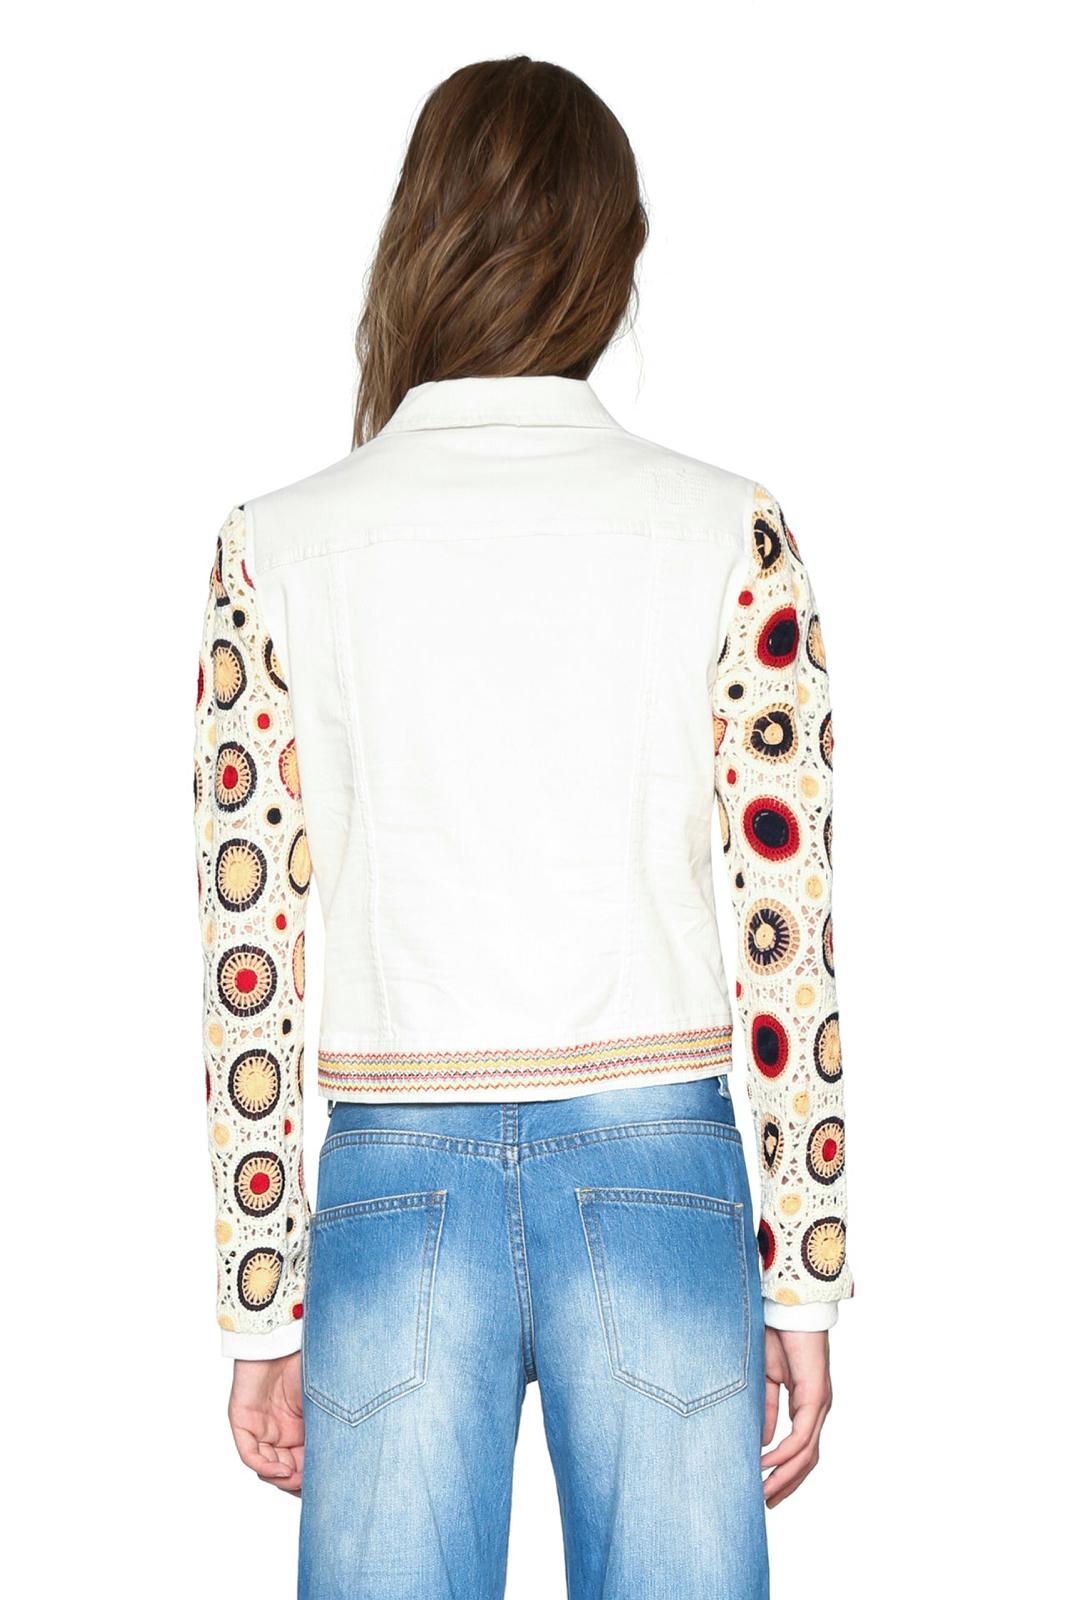 Desigual Women's Kenya Denim Crochet Sleeve Jacket